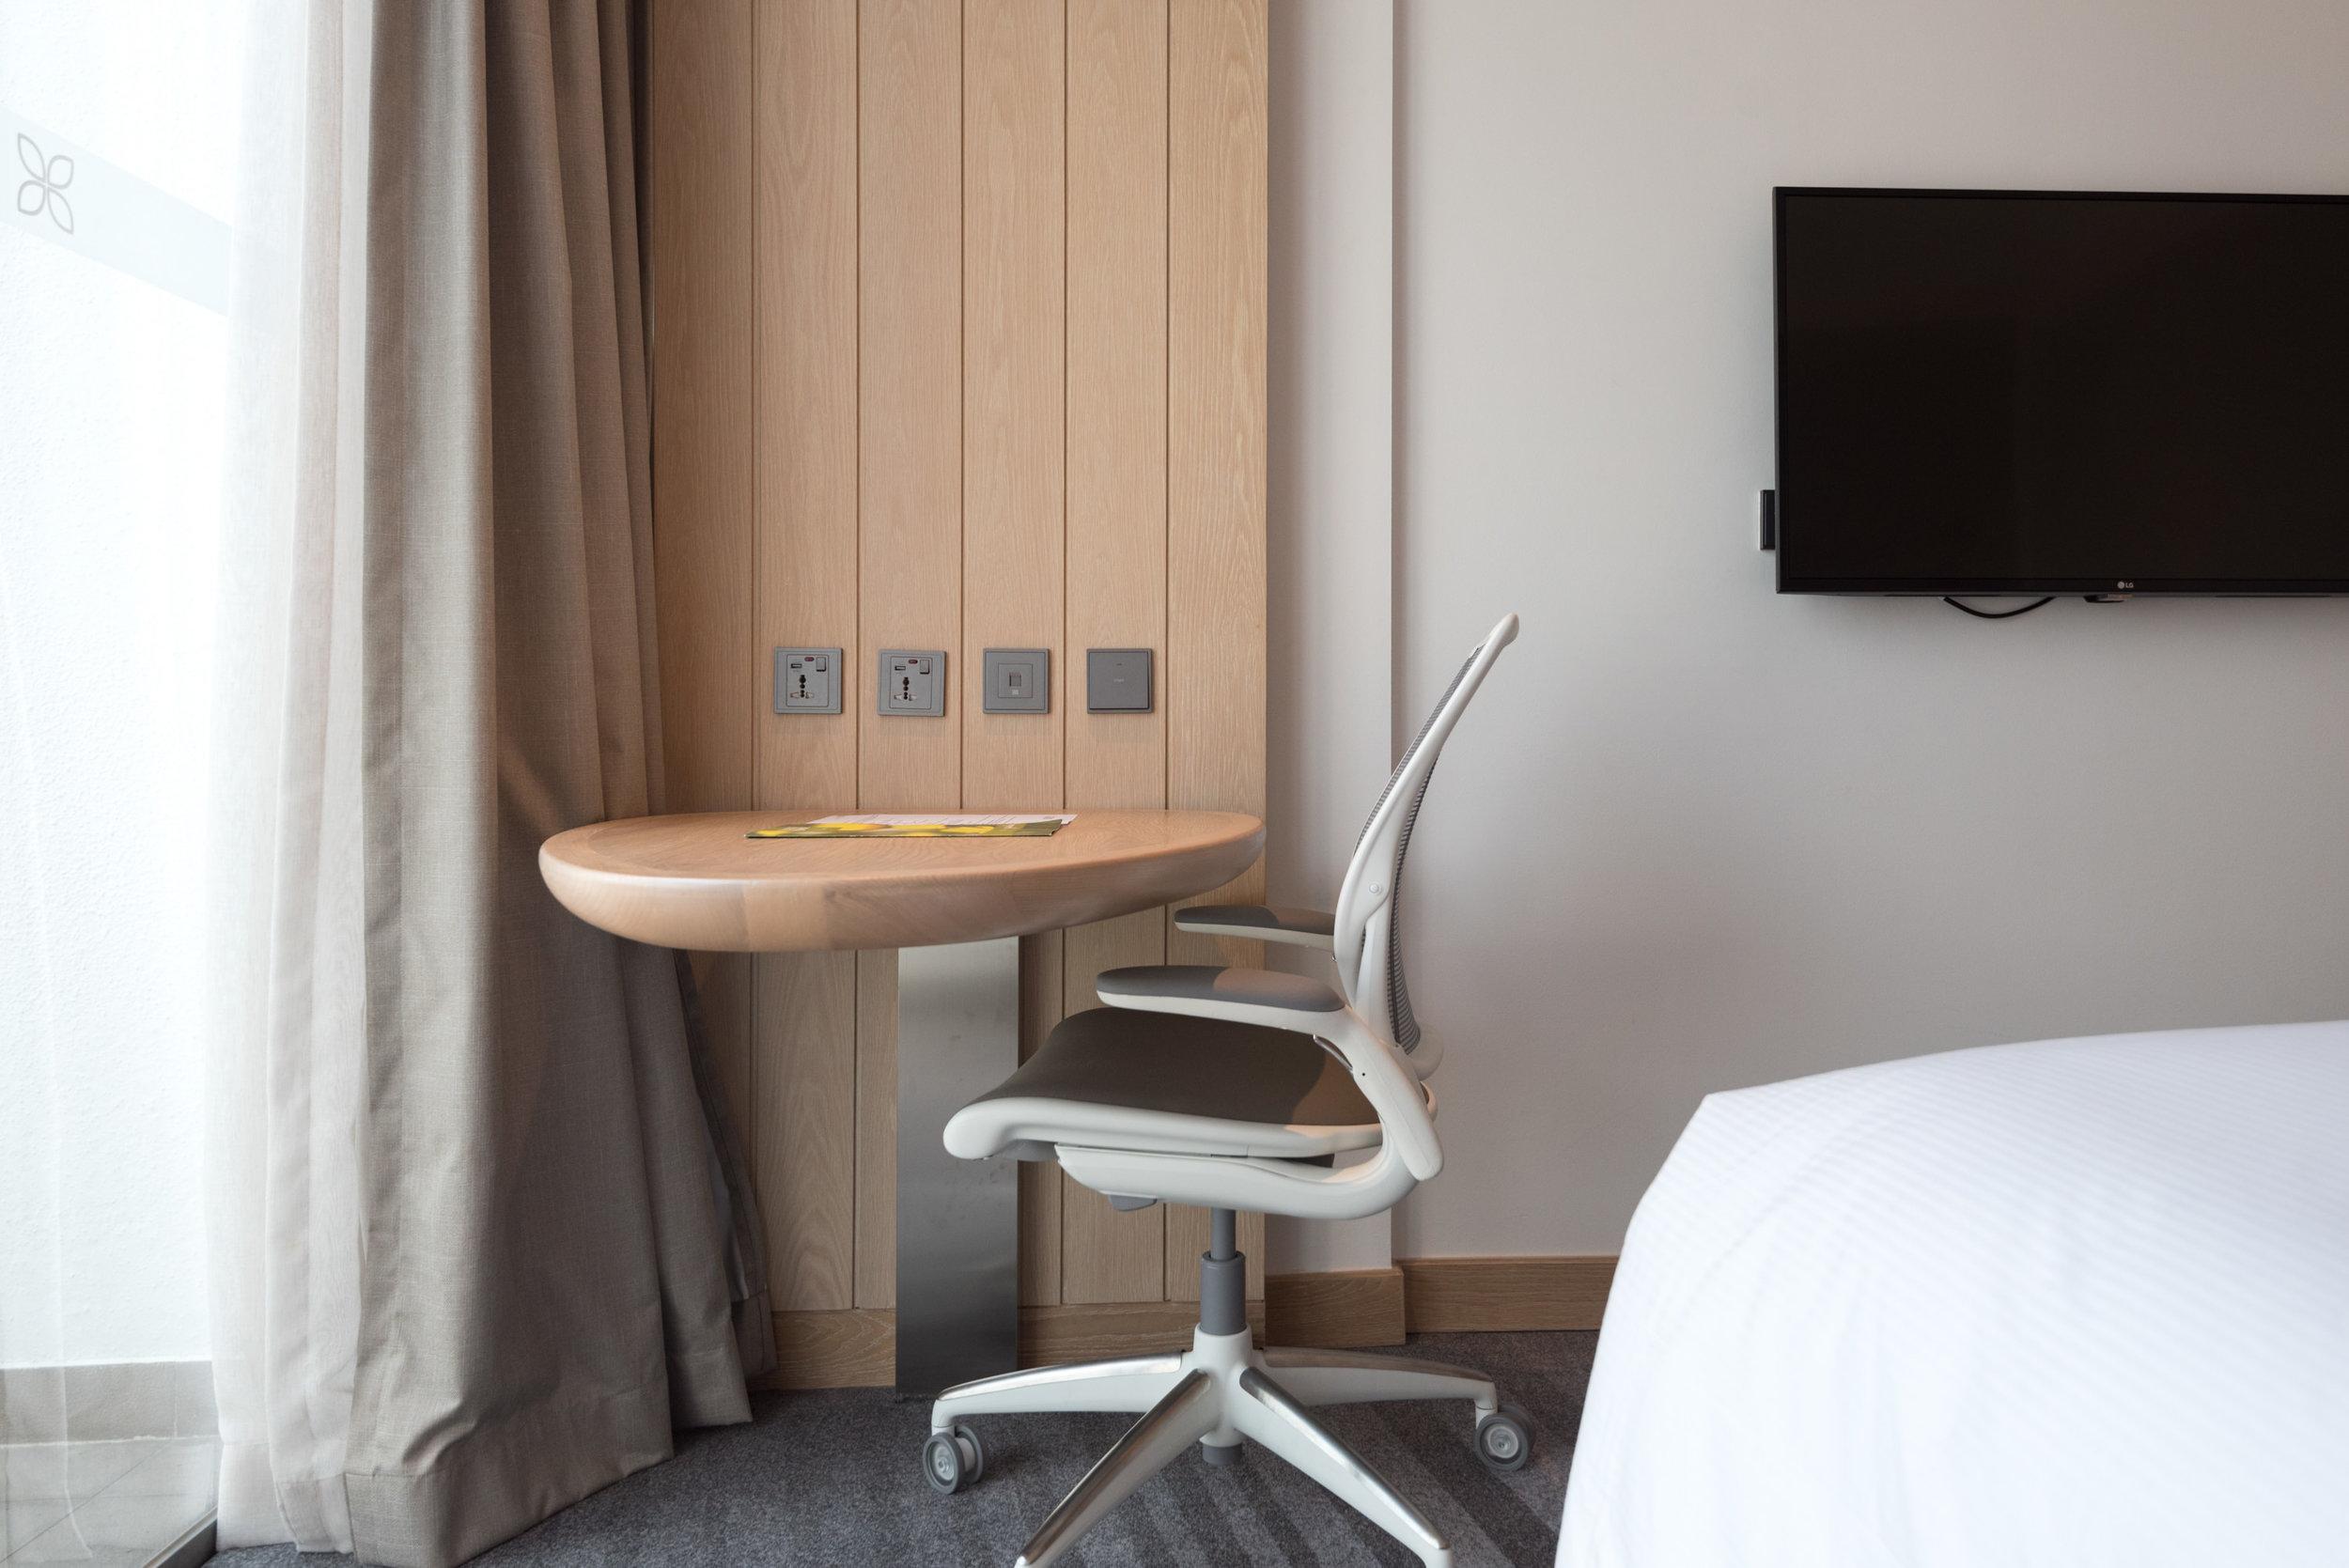 Work Desk  King Deluxe Room with Balcony - Hilton Garden Inn Singapore Serangoon